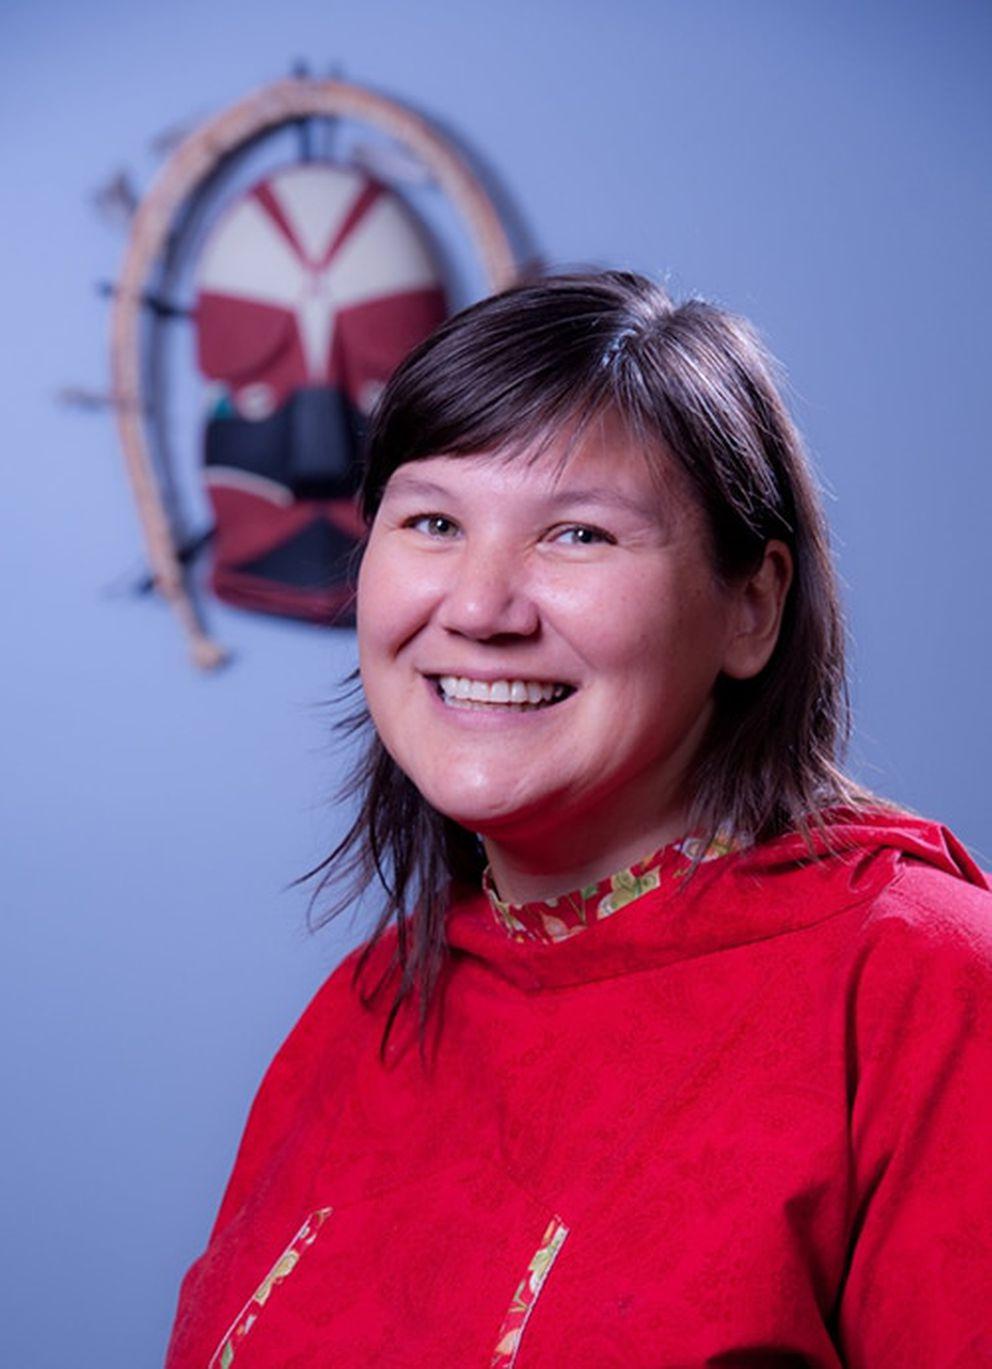 Alaska Pacific University President Valerie Nurr'araaluk Davidson is the school's first woman president.